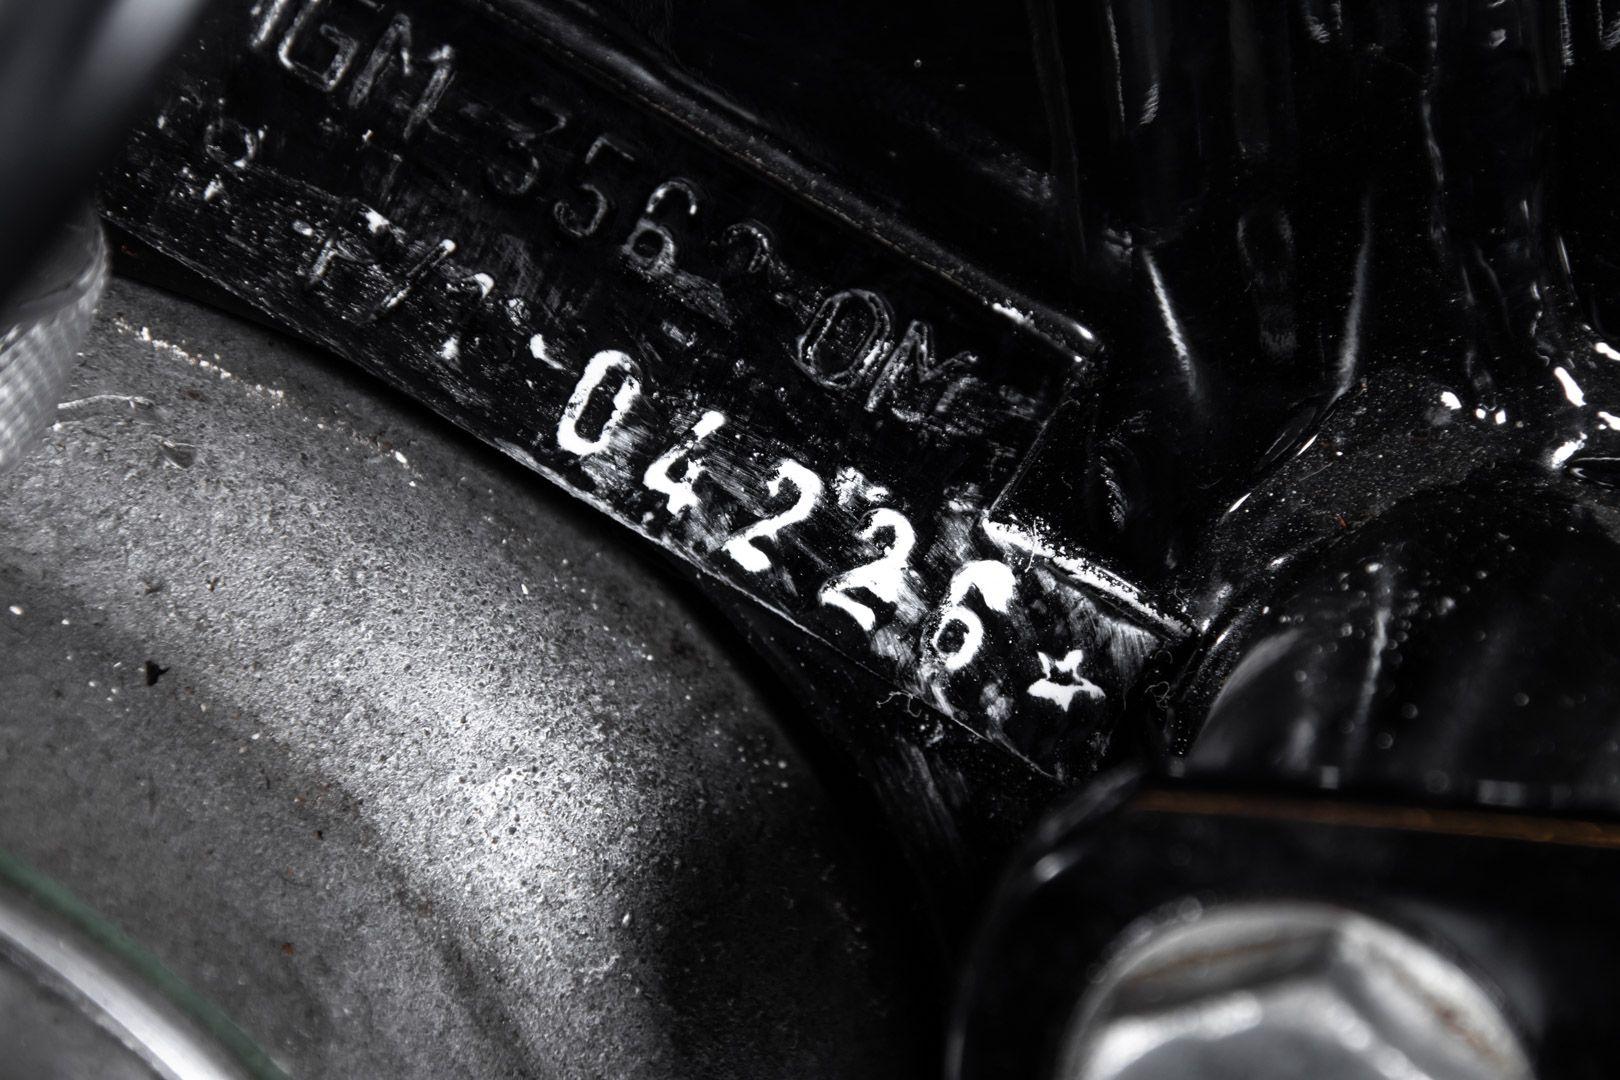 1971 Moto Morini Corsaro 150 82275